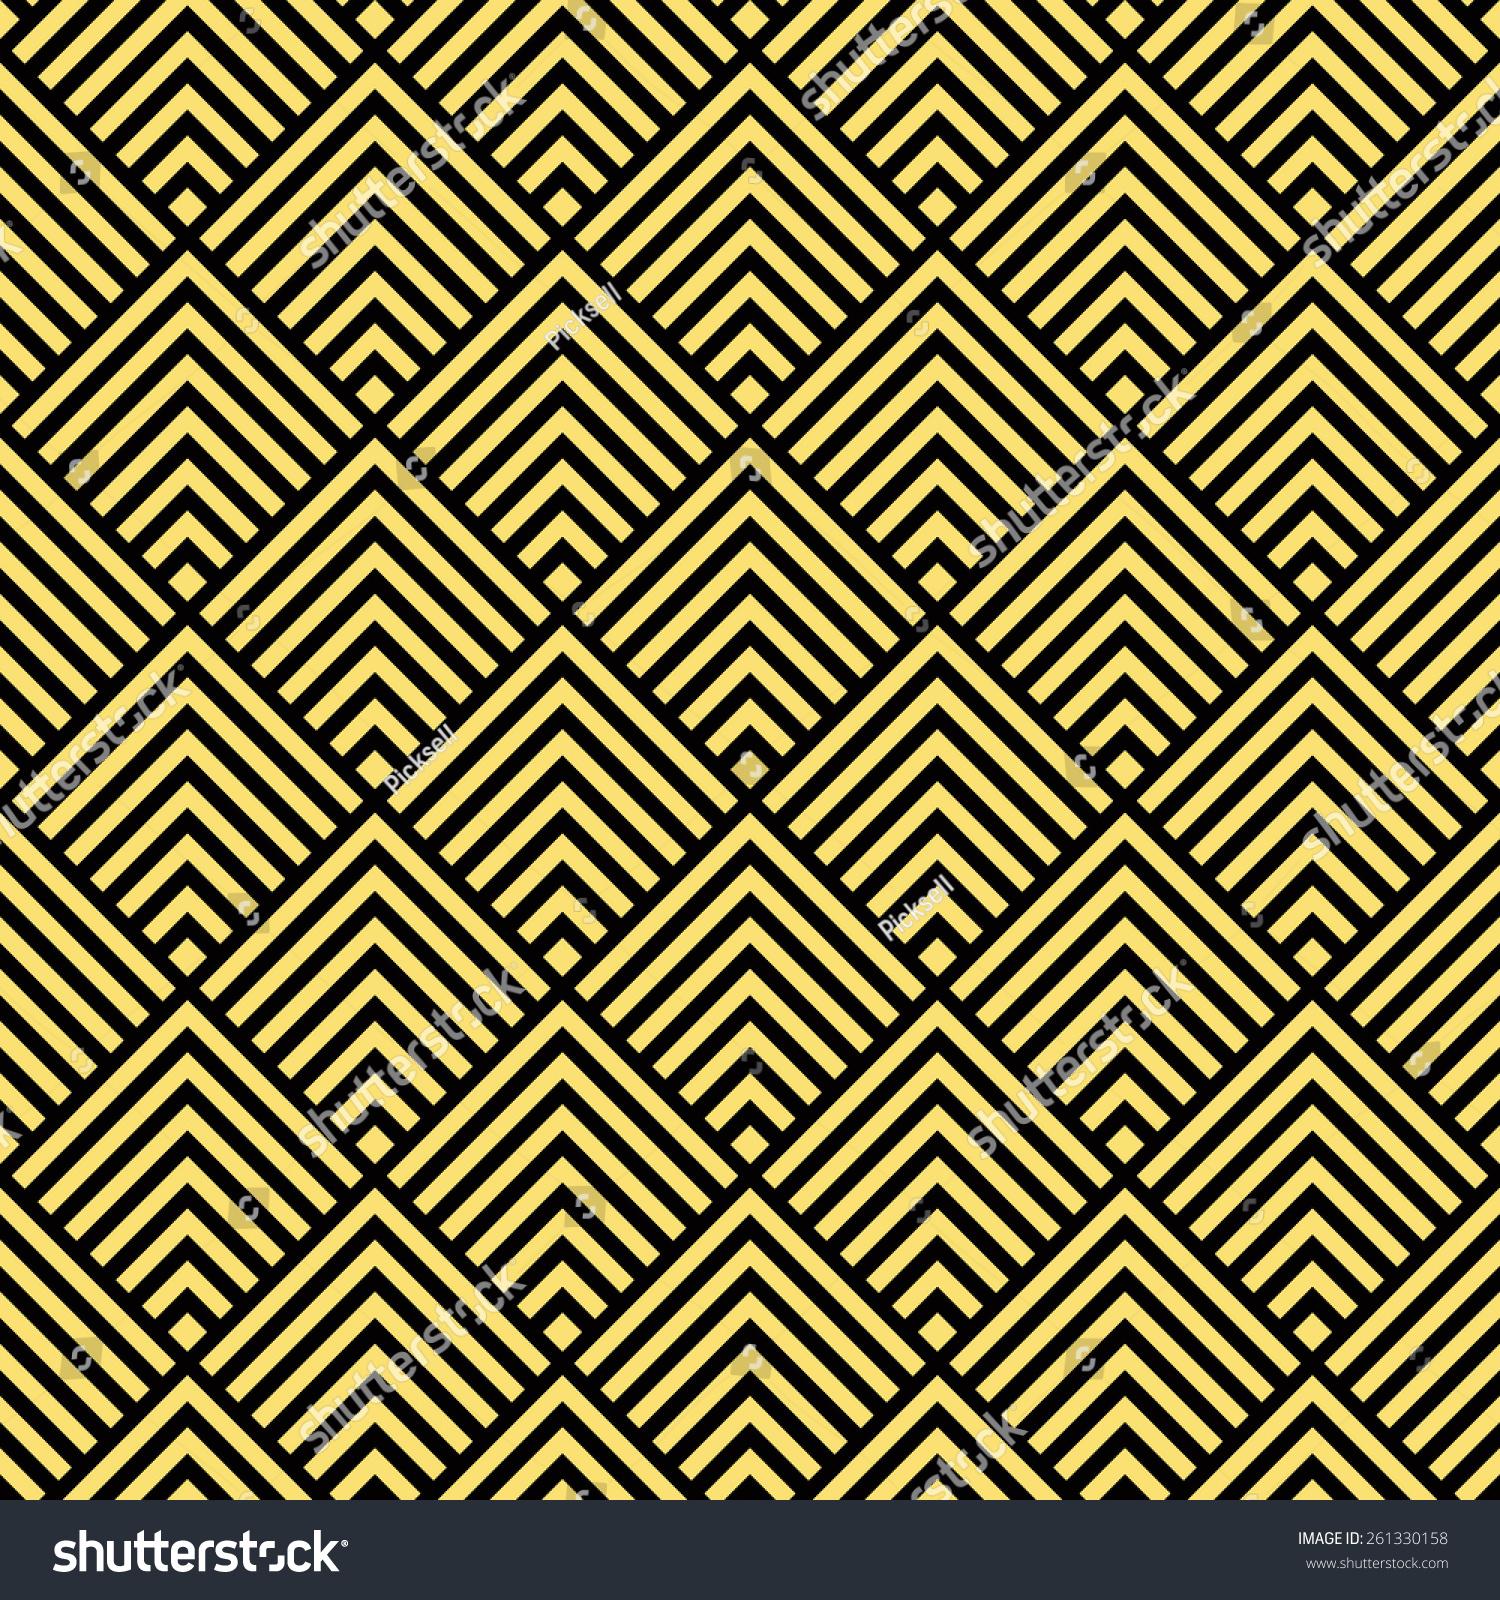 seamless black gold art deco square stock illustration 261330158 shutterstock. Black Bedroom Furniture Sets. Home Design Ideas